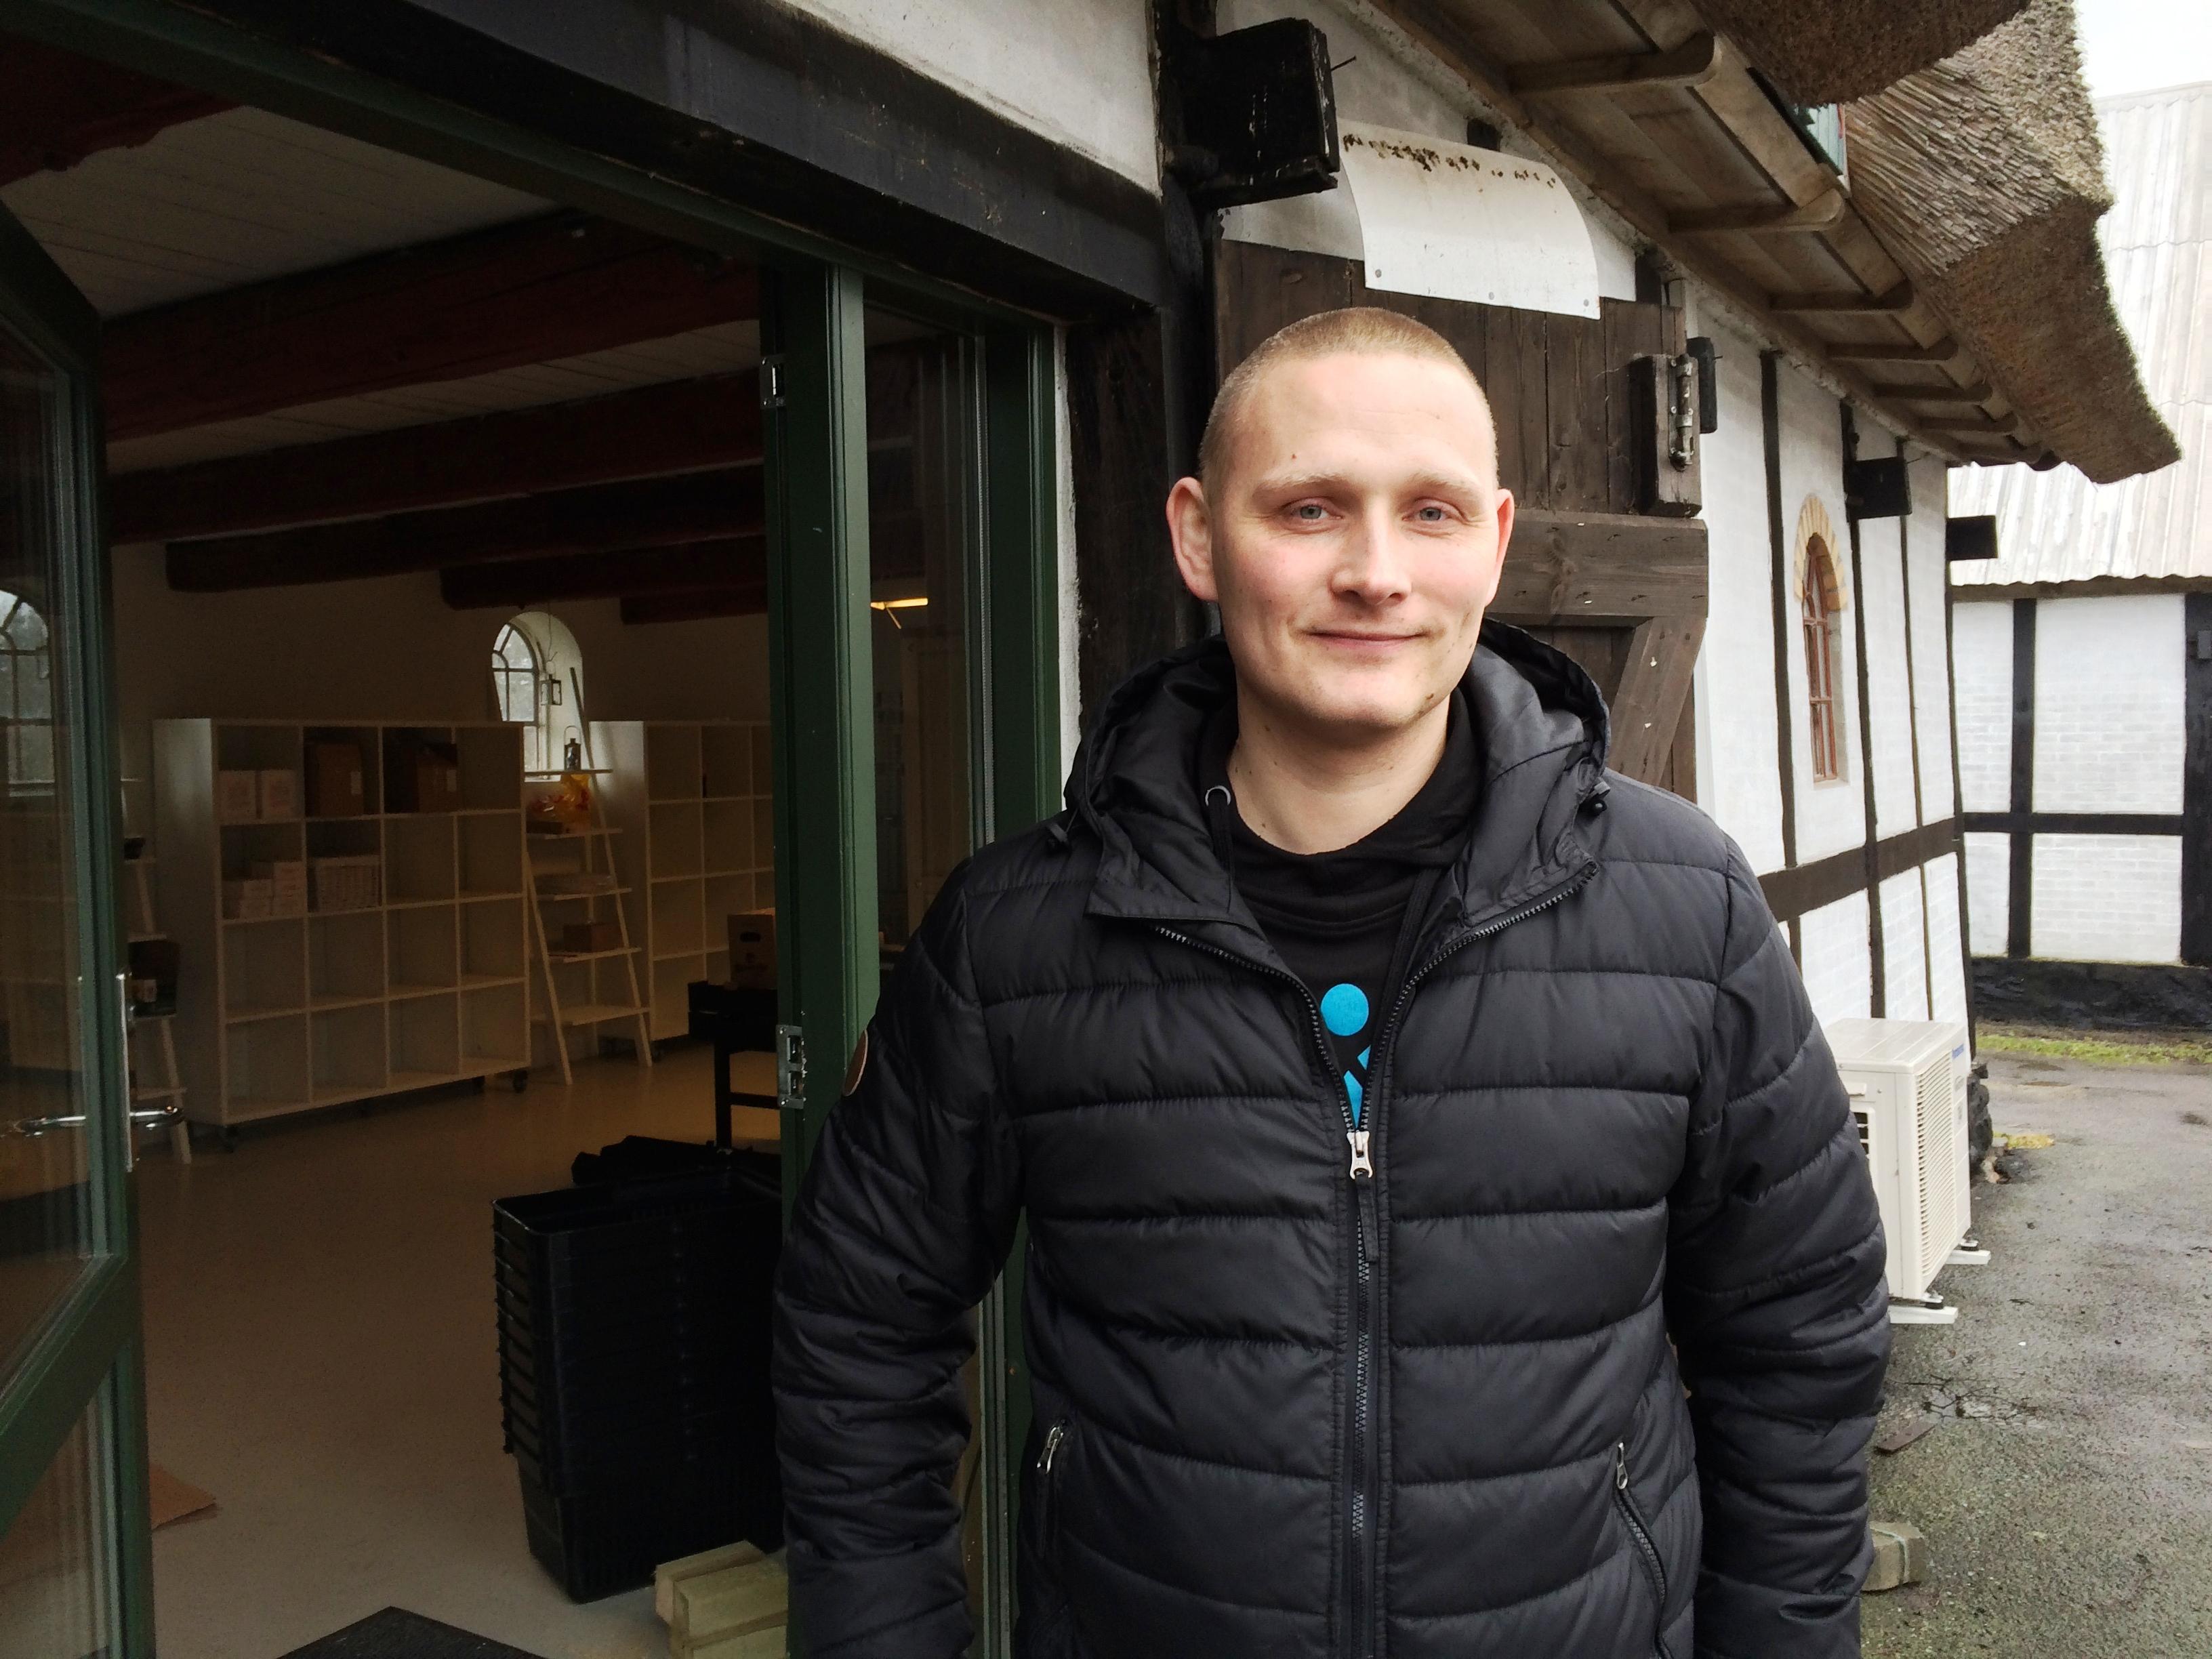 Morten Sander